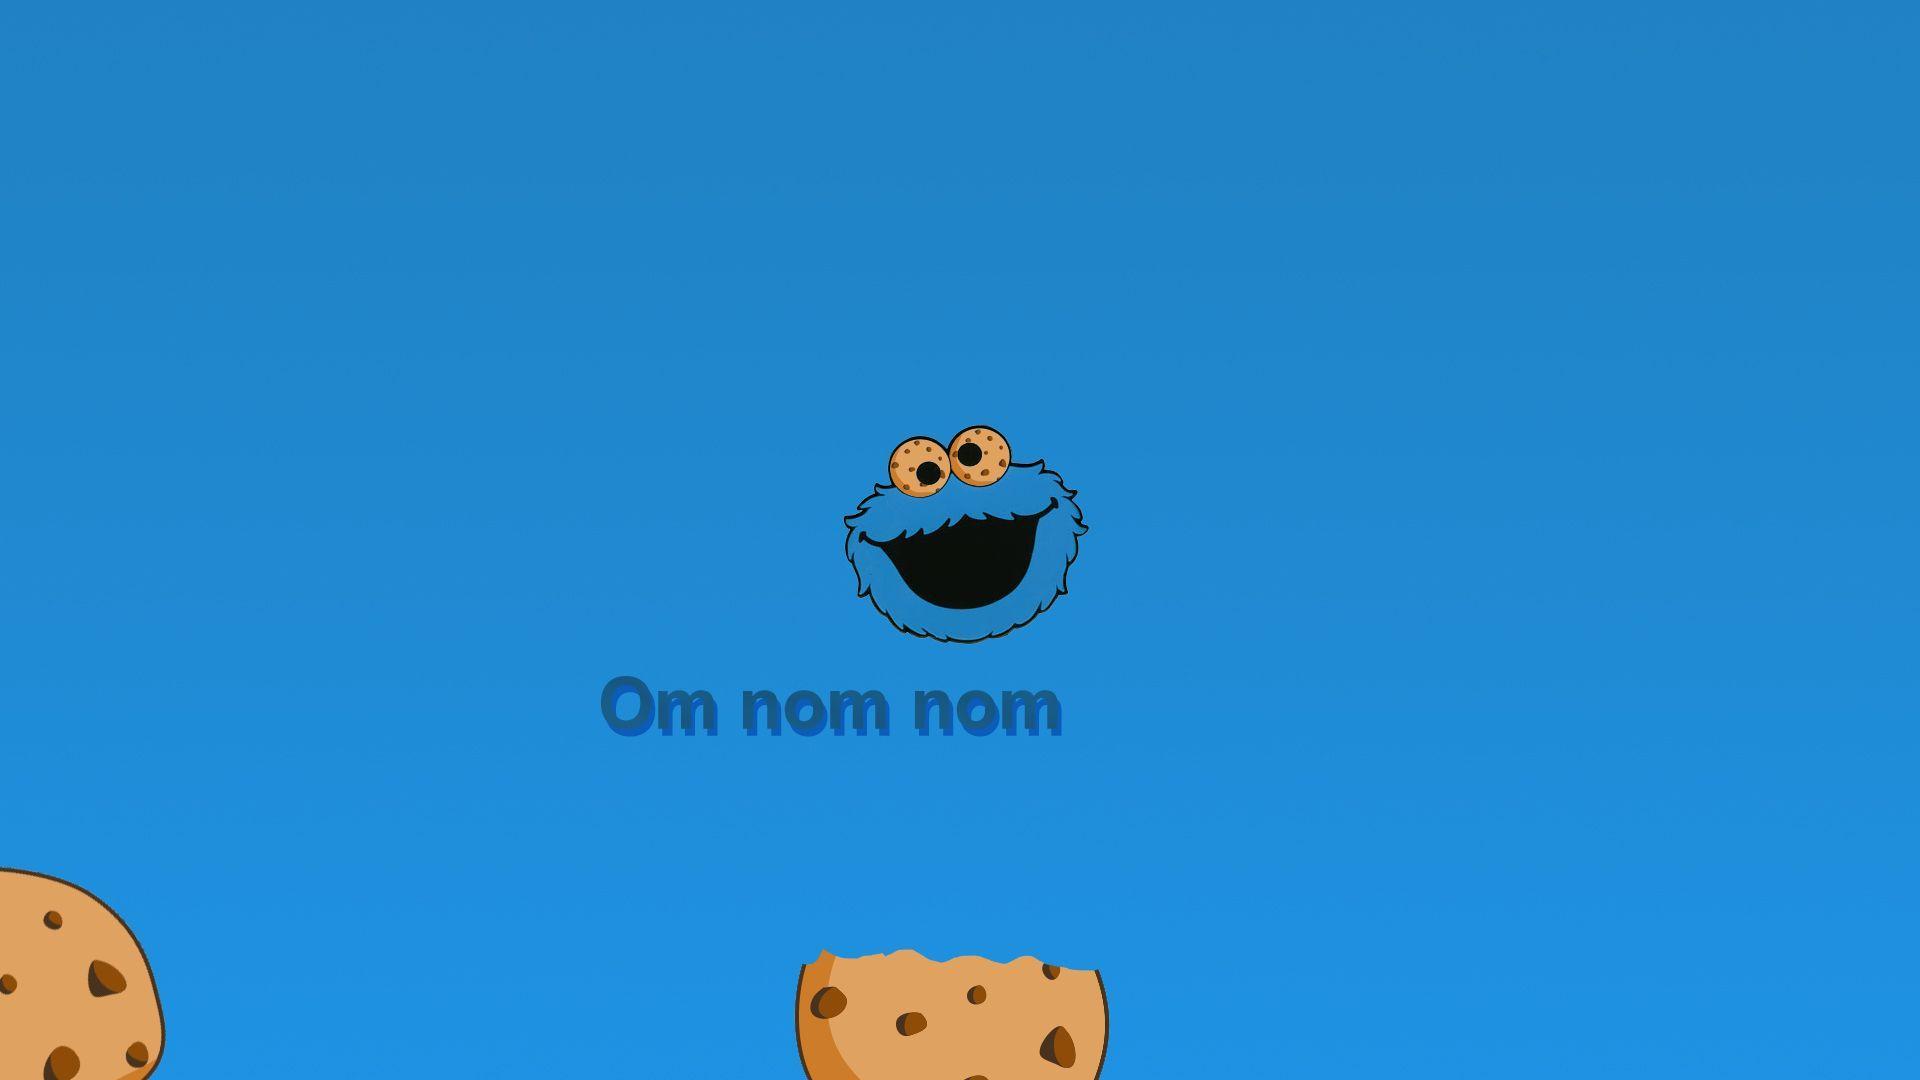 1280x1024 Cute Cookie Monster Wallpapers